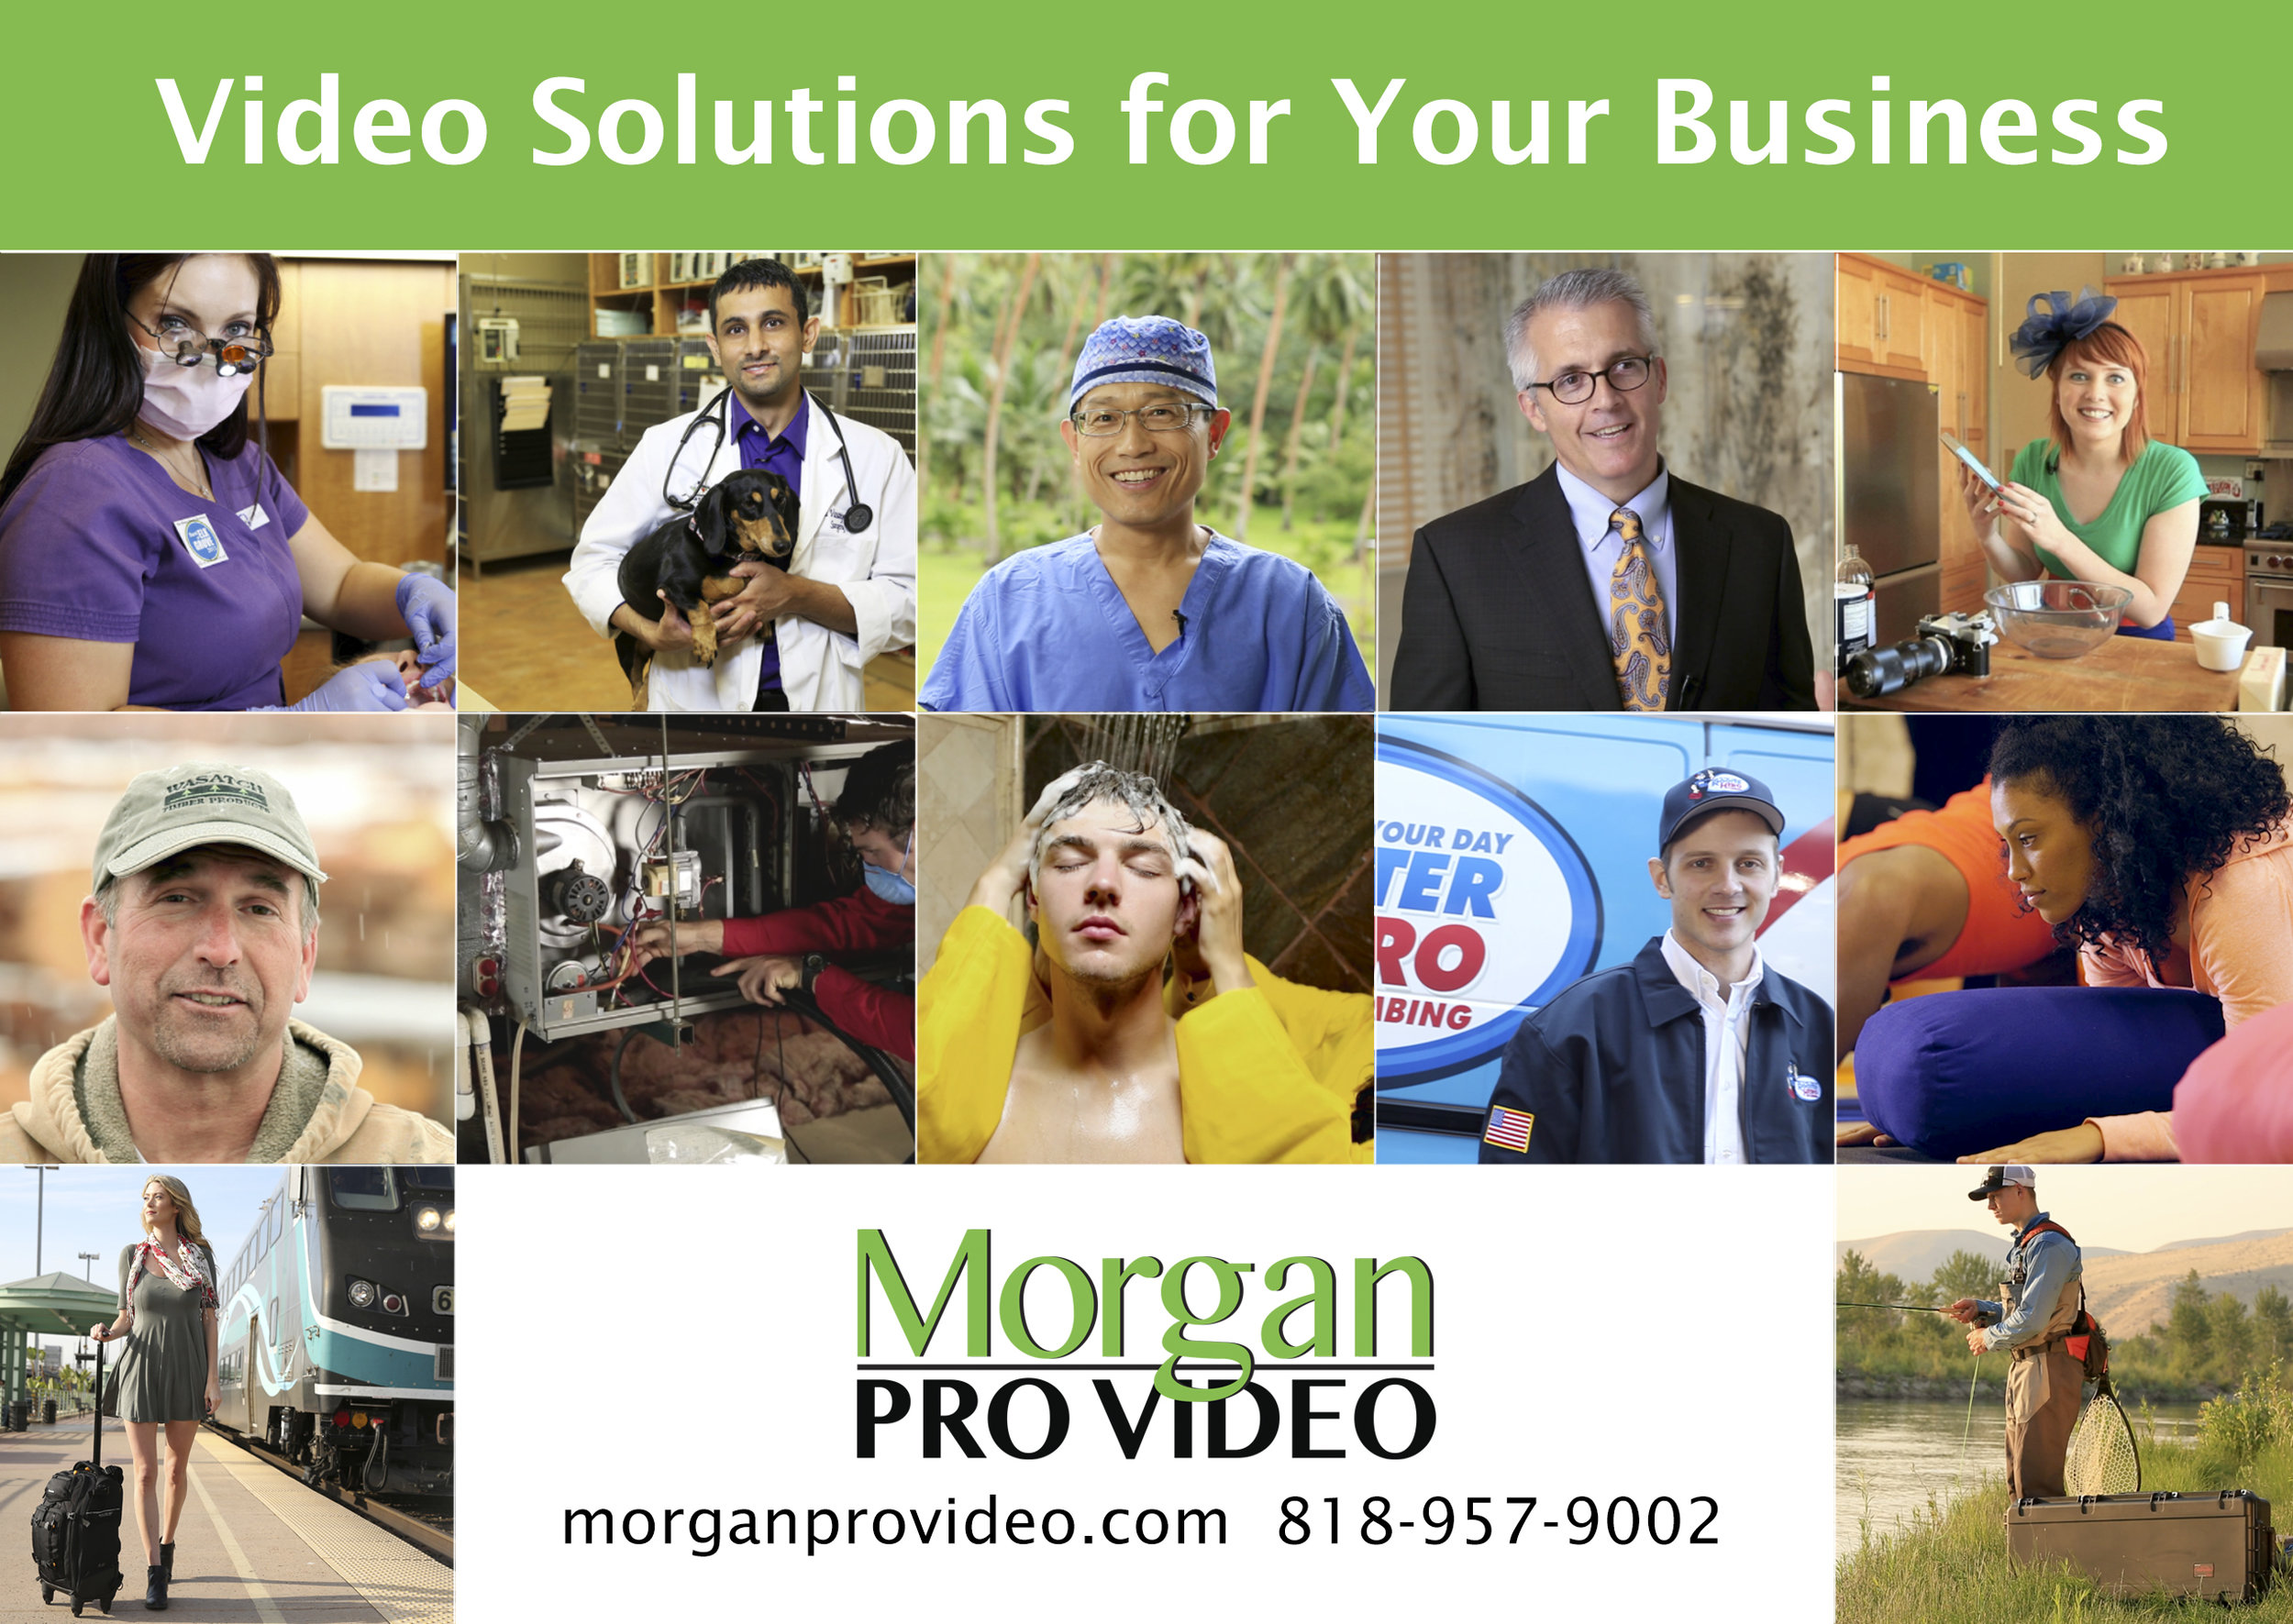 Morgan Pro Video